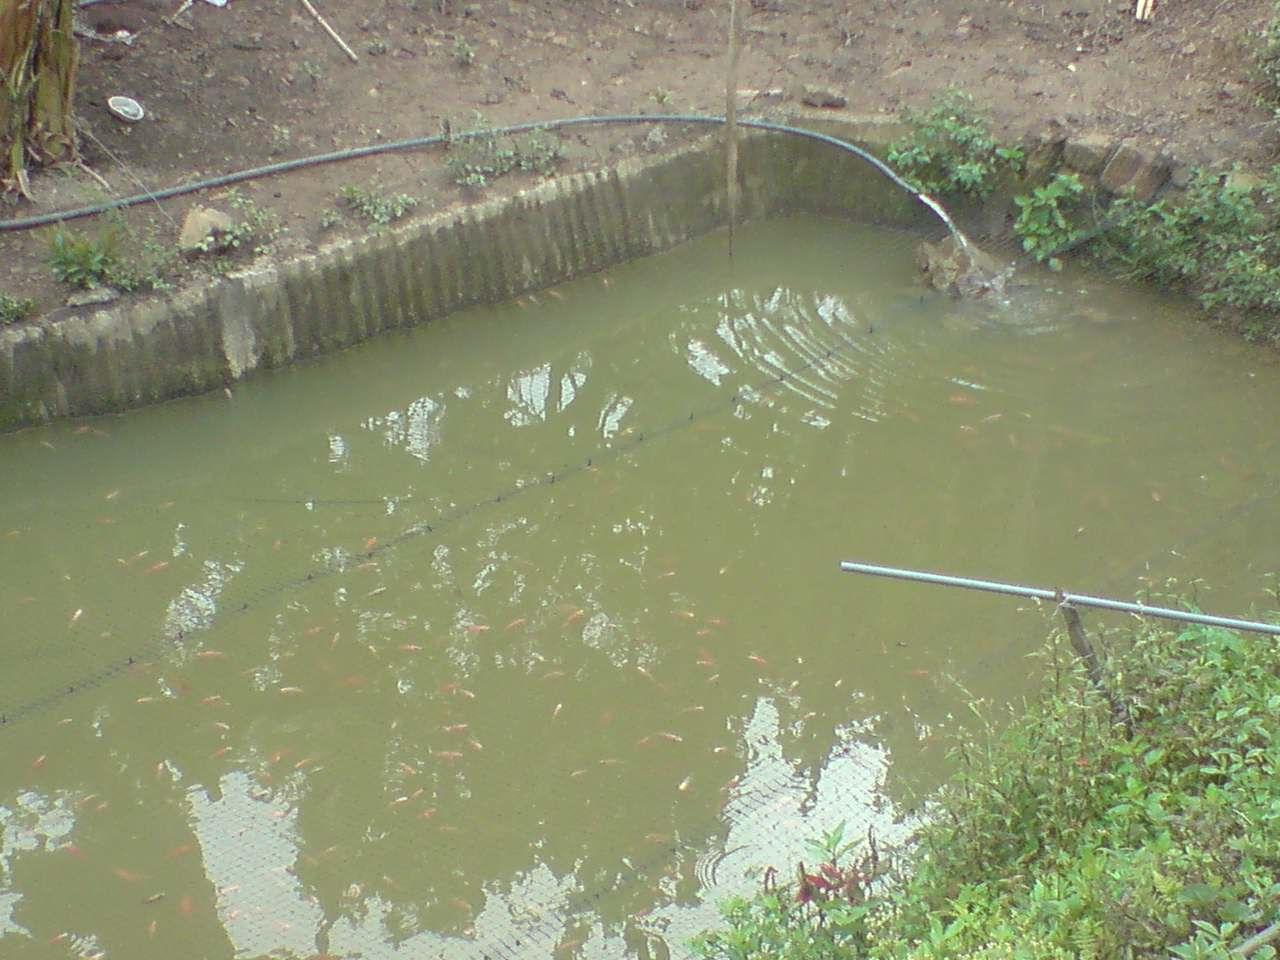 Ryg piscicultura bogota venta de mojarra y carpa cultivo for Pozos para peces